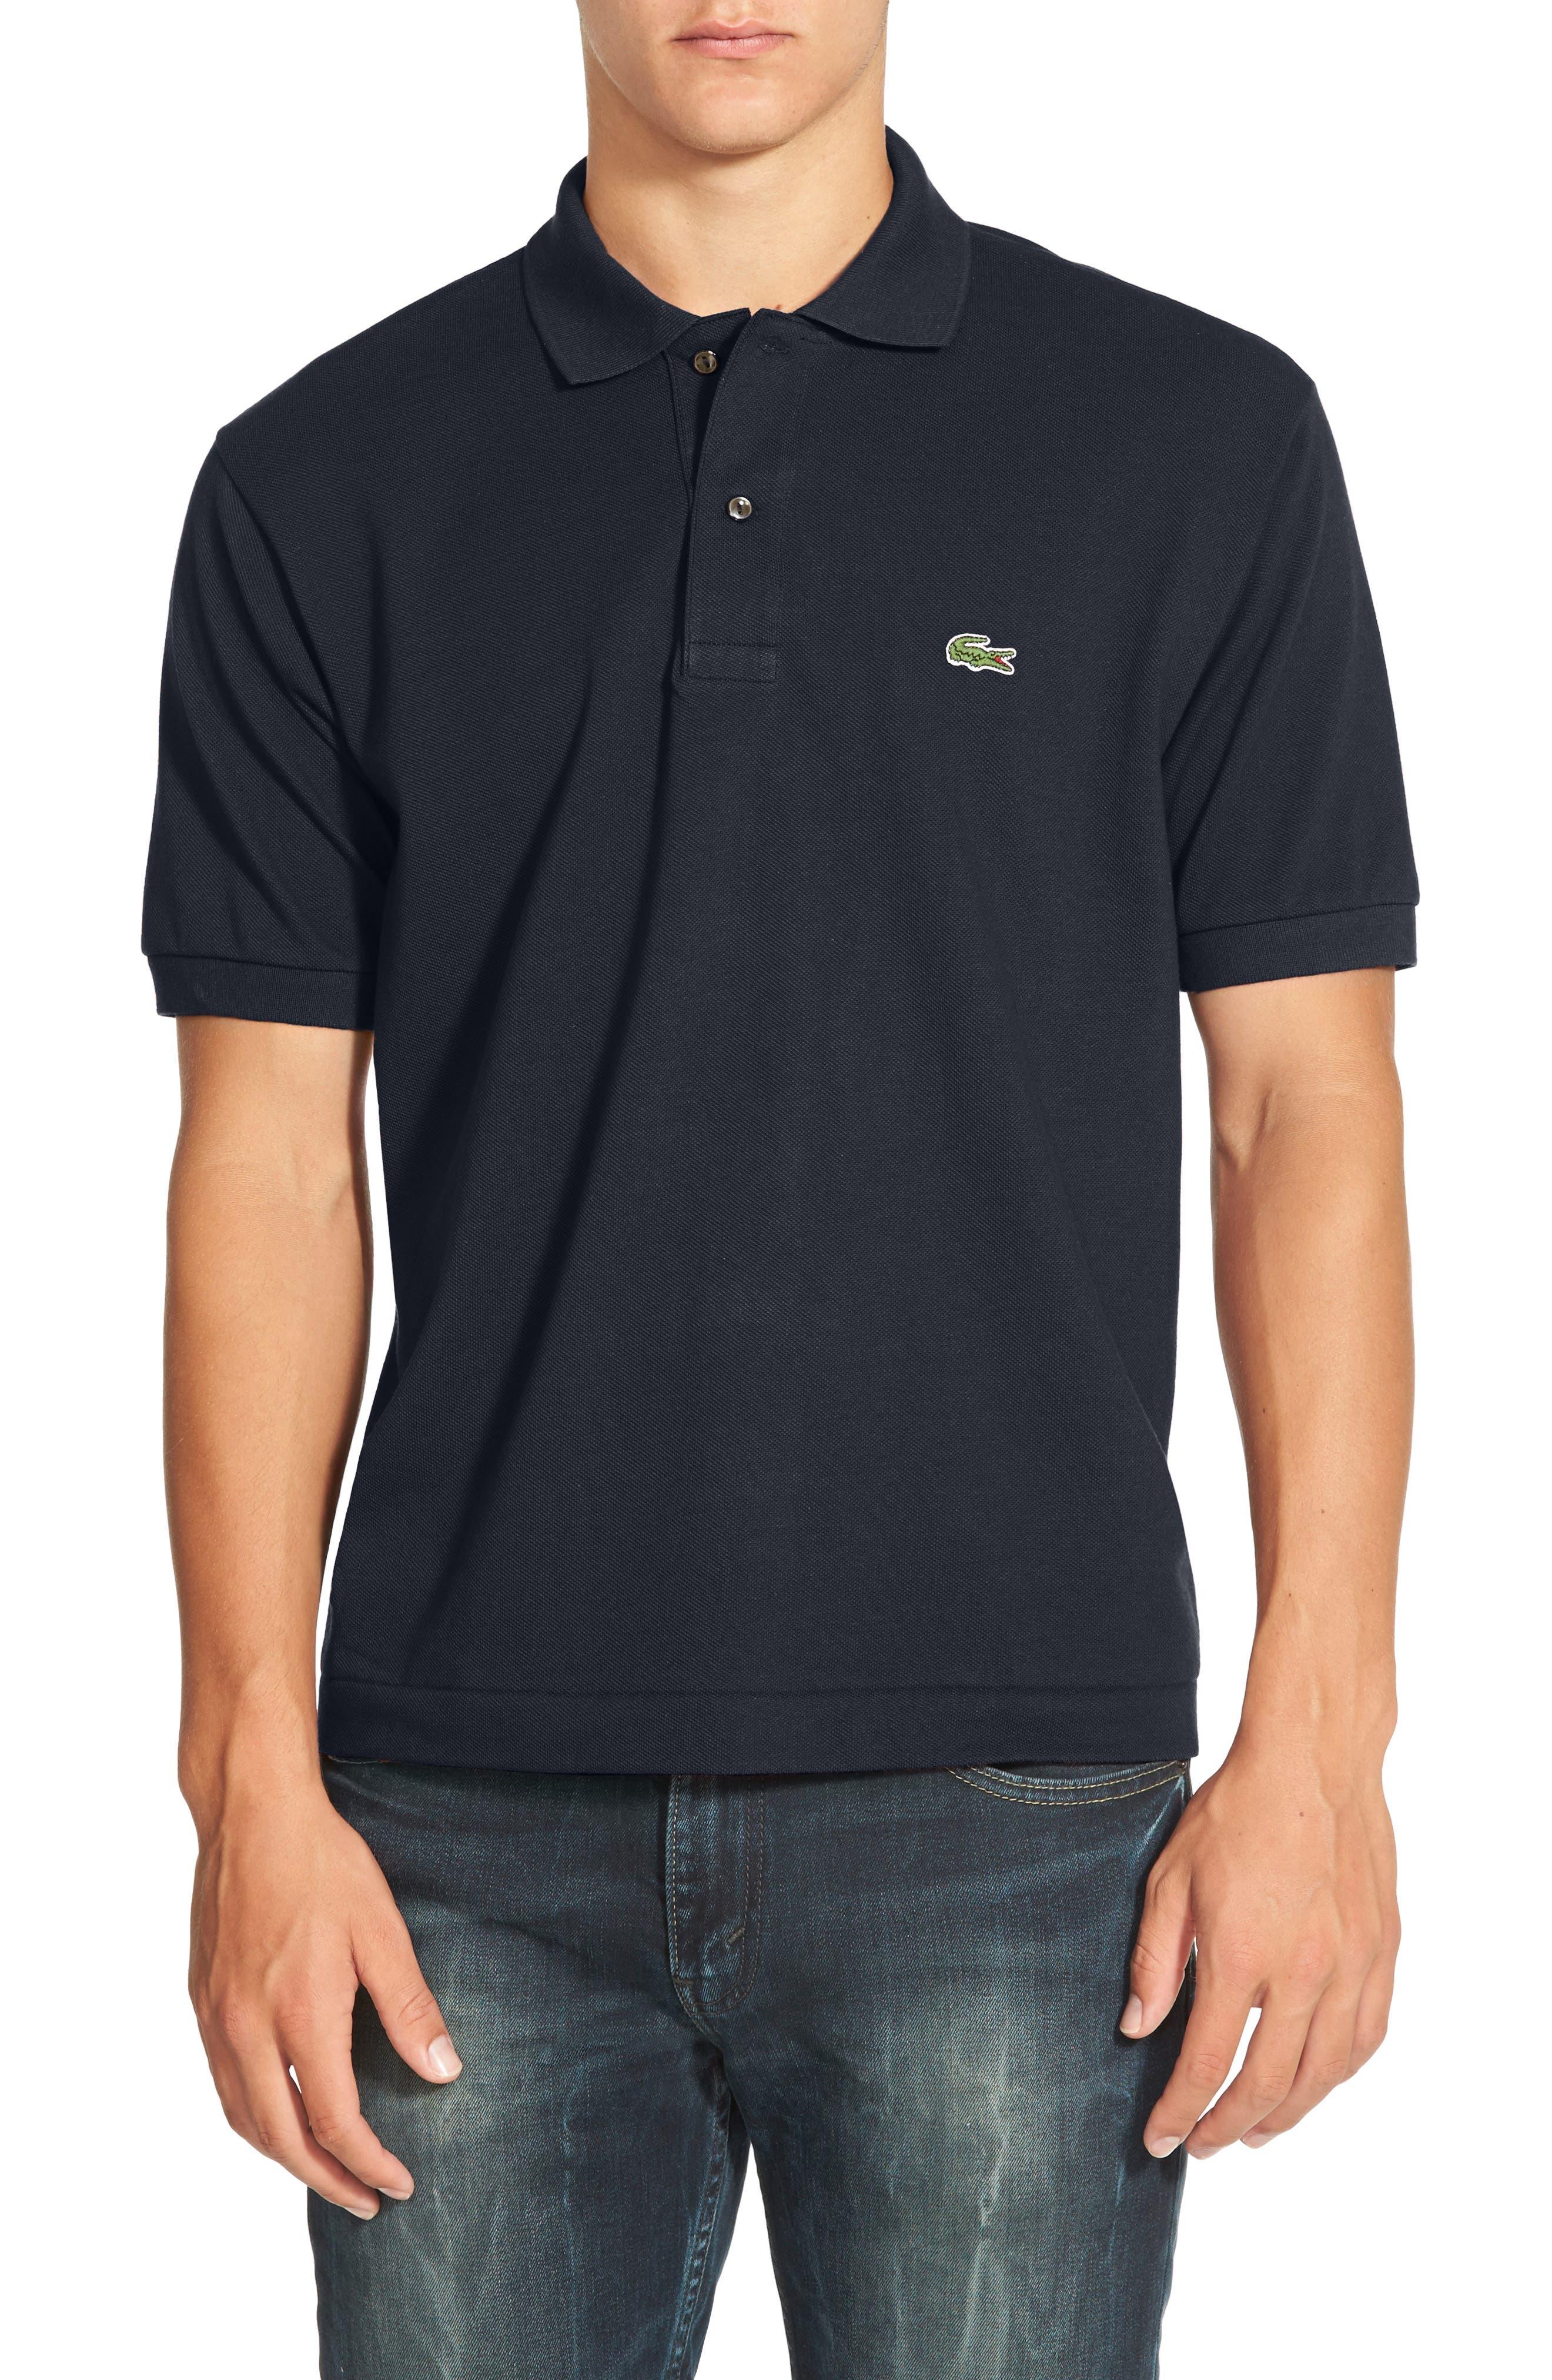 ecf1fba3d1e7 Men's Clothing | Nordstrom